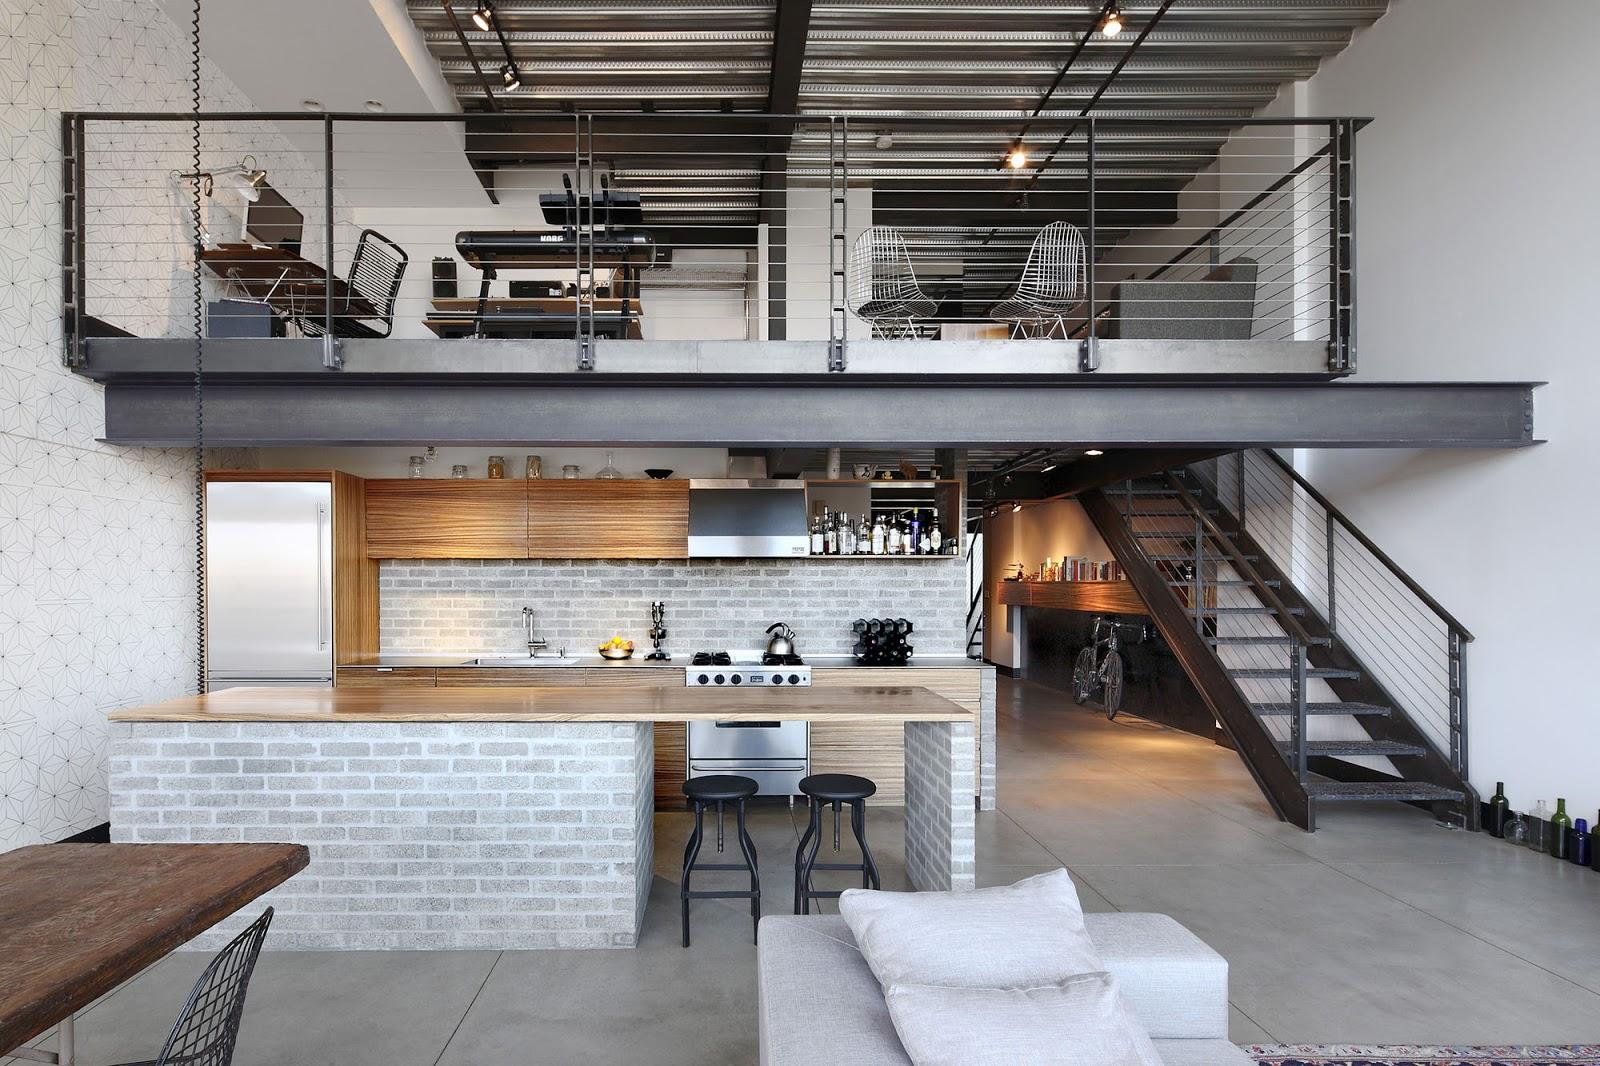 real home design | architecture & interior design ideas: custom